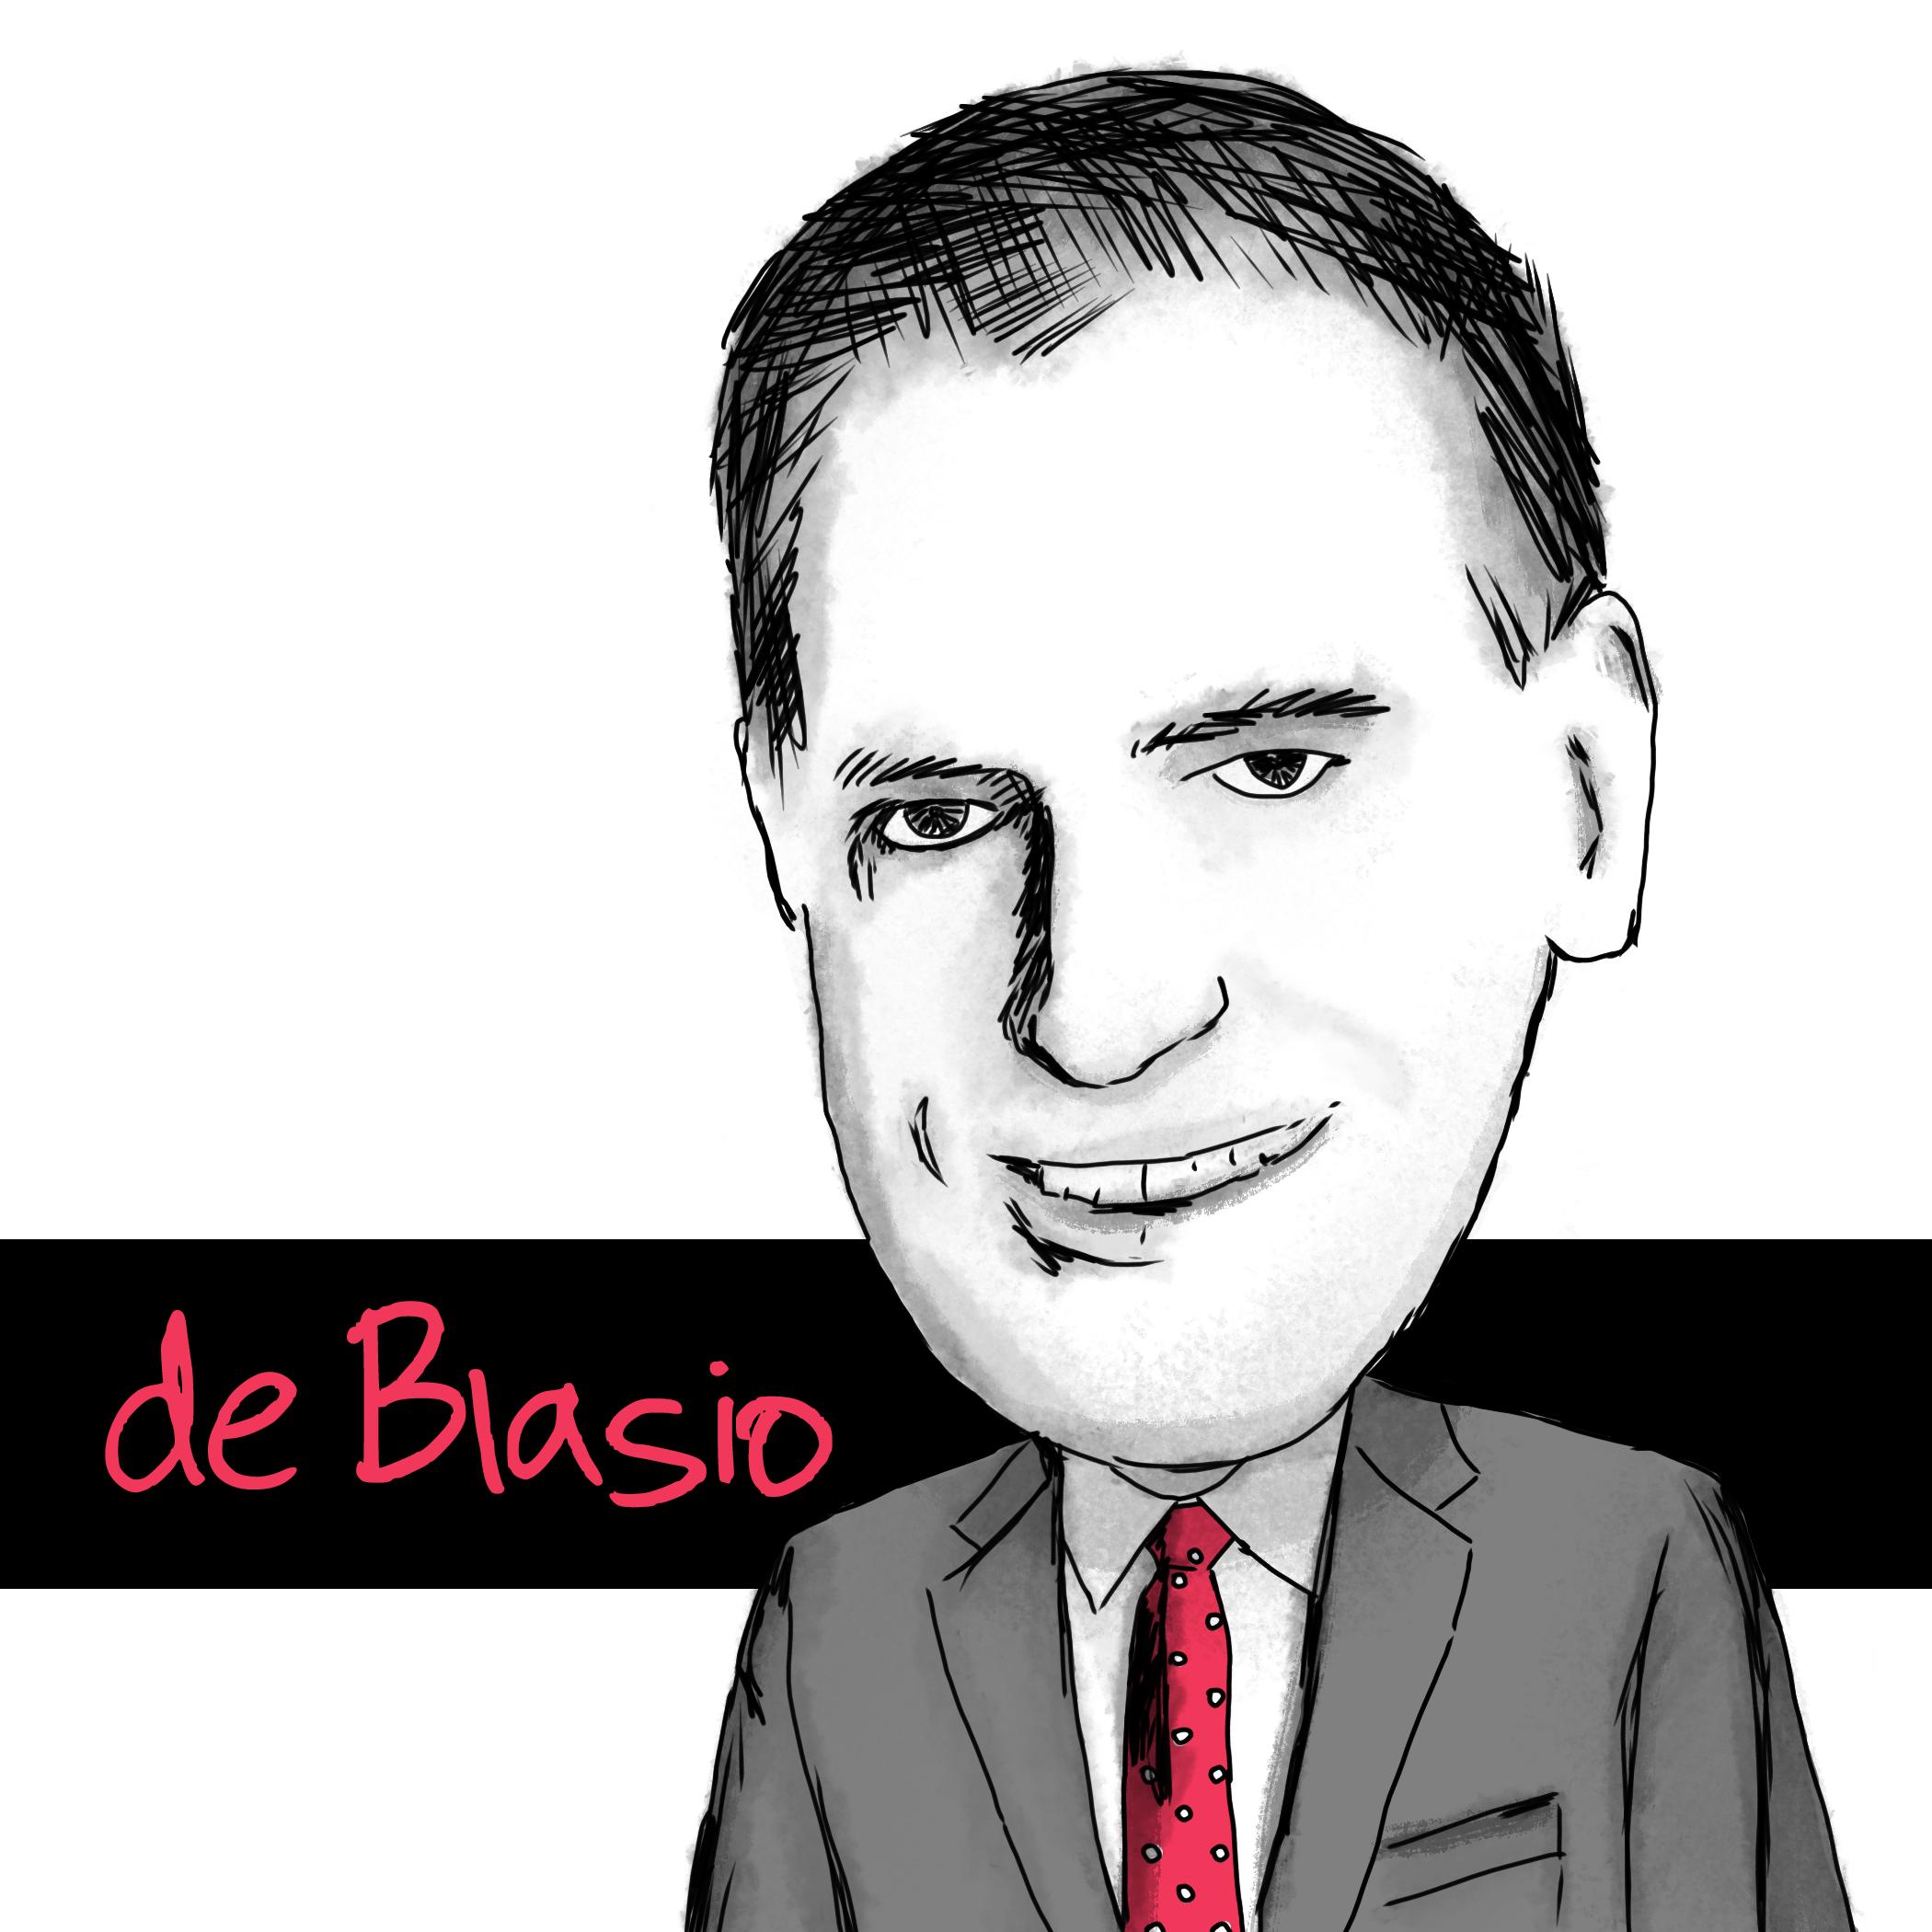 Bill de Blasio - A President That Puts Working People First - https://billdeblasio.com